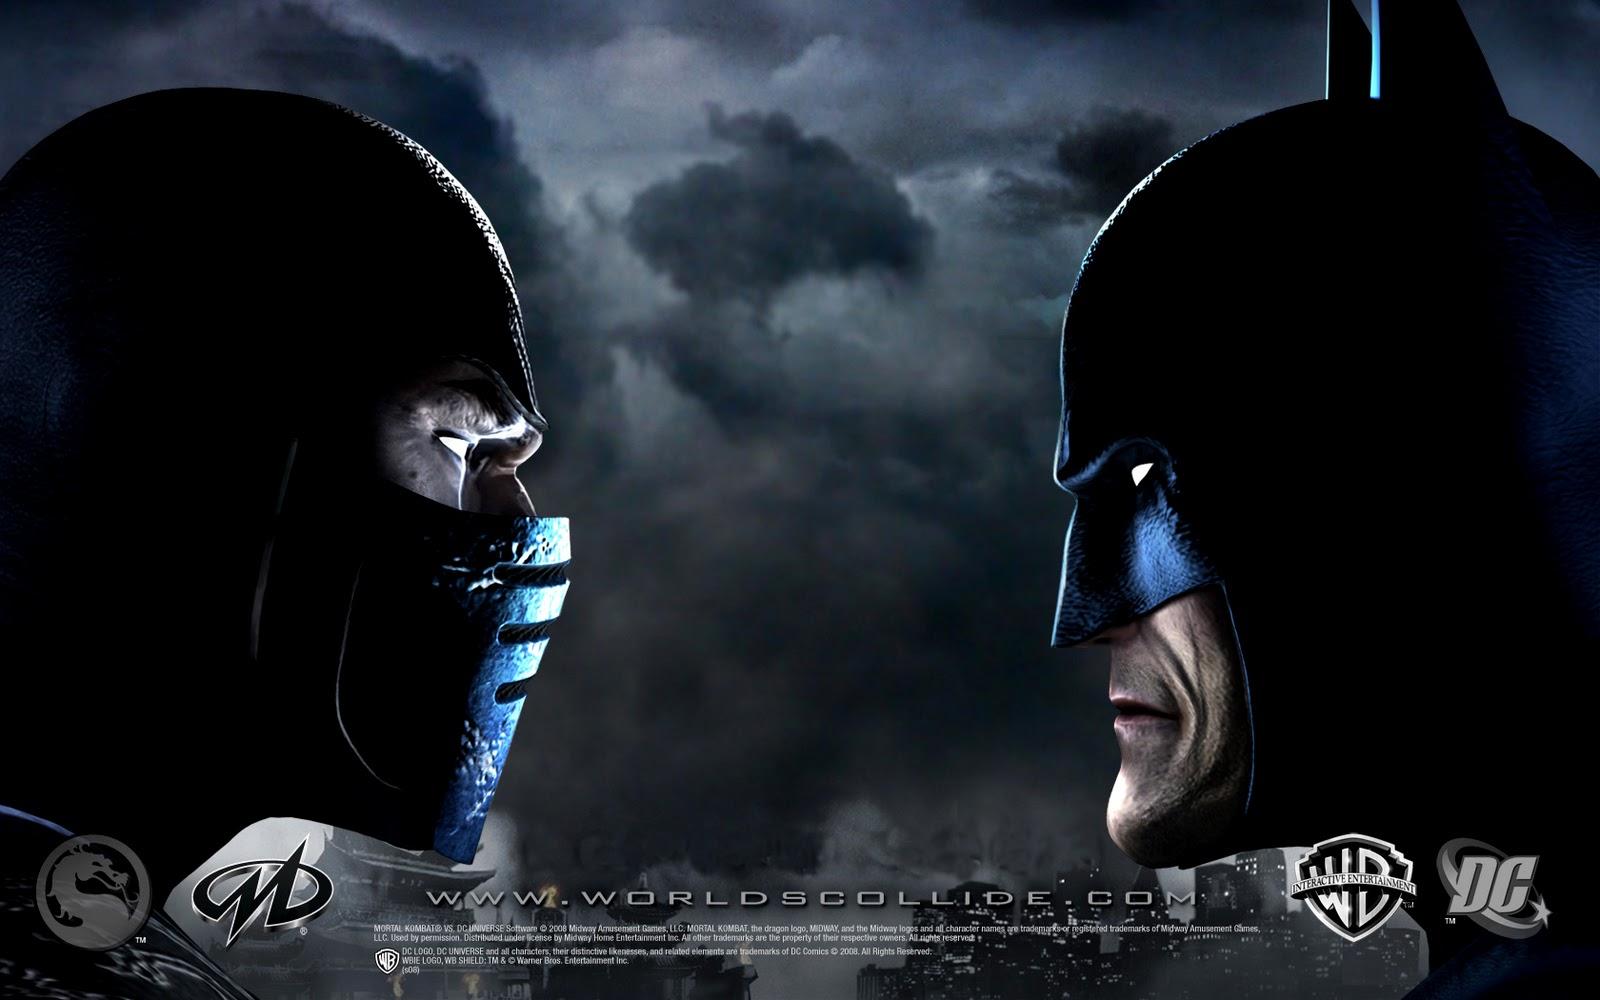 http://3.bp.blogspot.com/-_OxZjfq8RwU/TnXo8oYGnwI/AAAAAAAADHc/EyEEDbdsI44/s1600/Mortal_Combat_vs_DC_Universe_HD_Wallpaper_Vvallpaper.NET.jpg